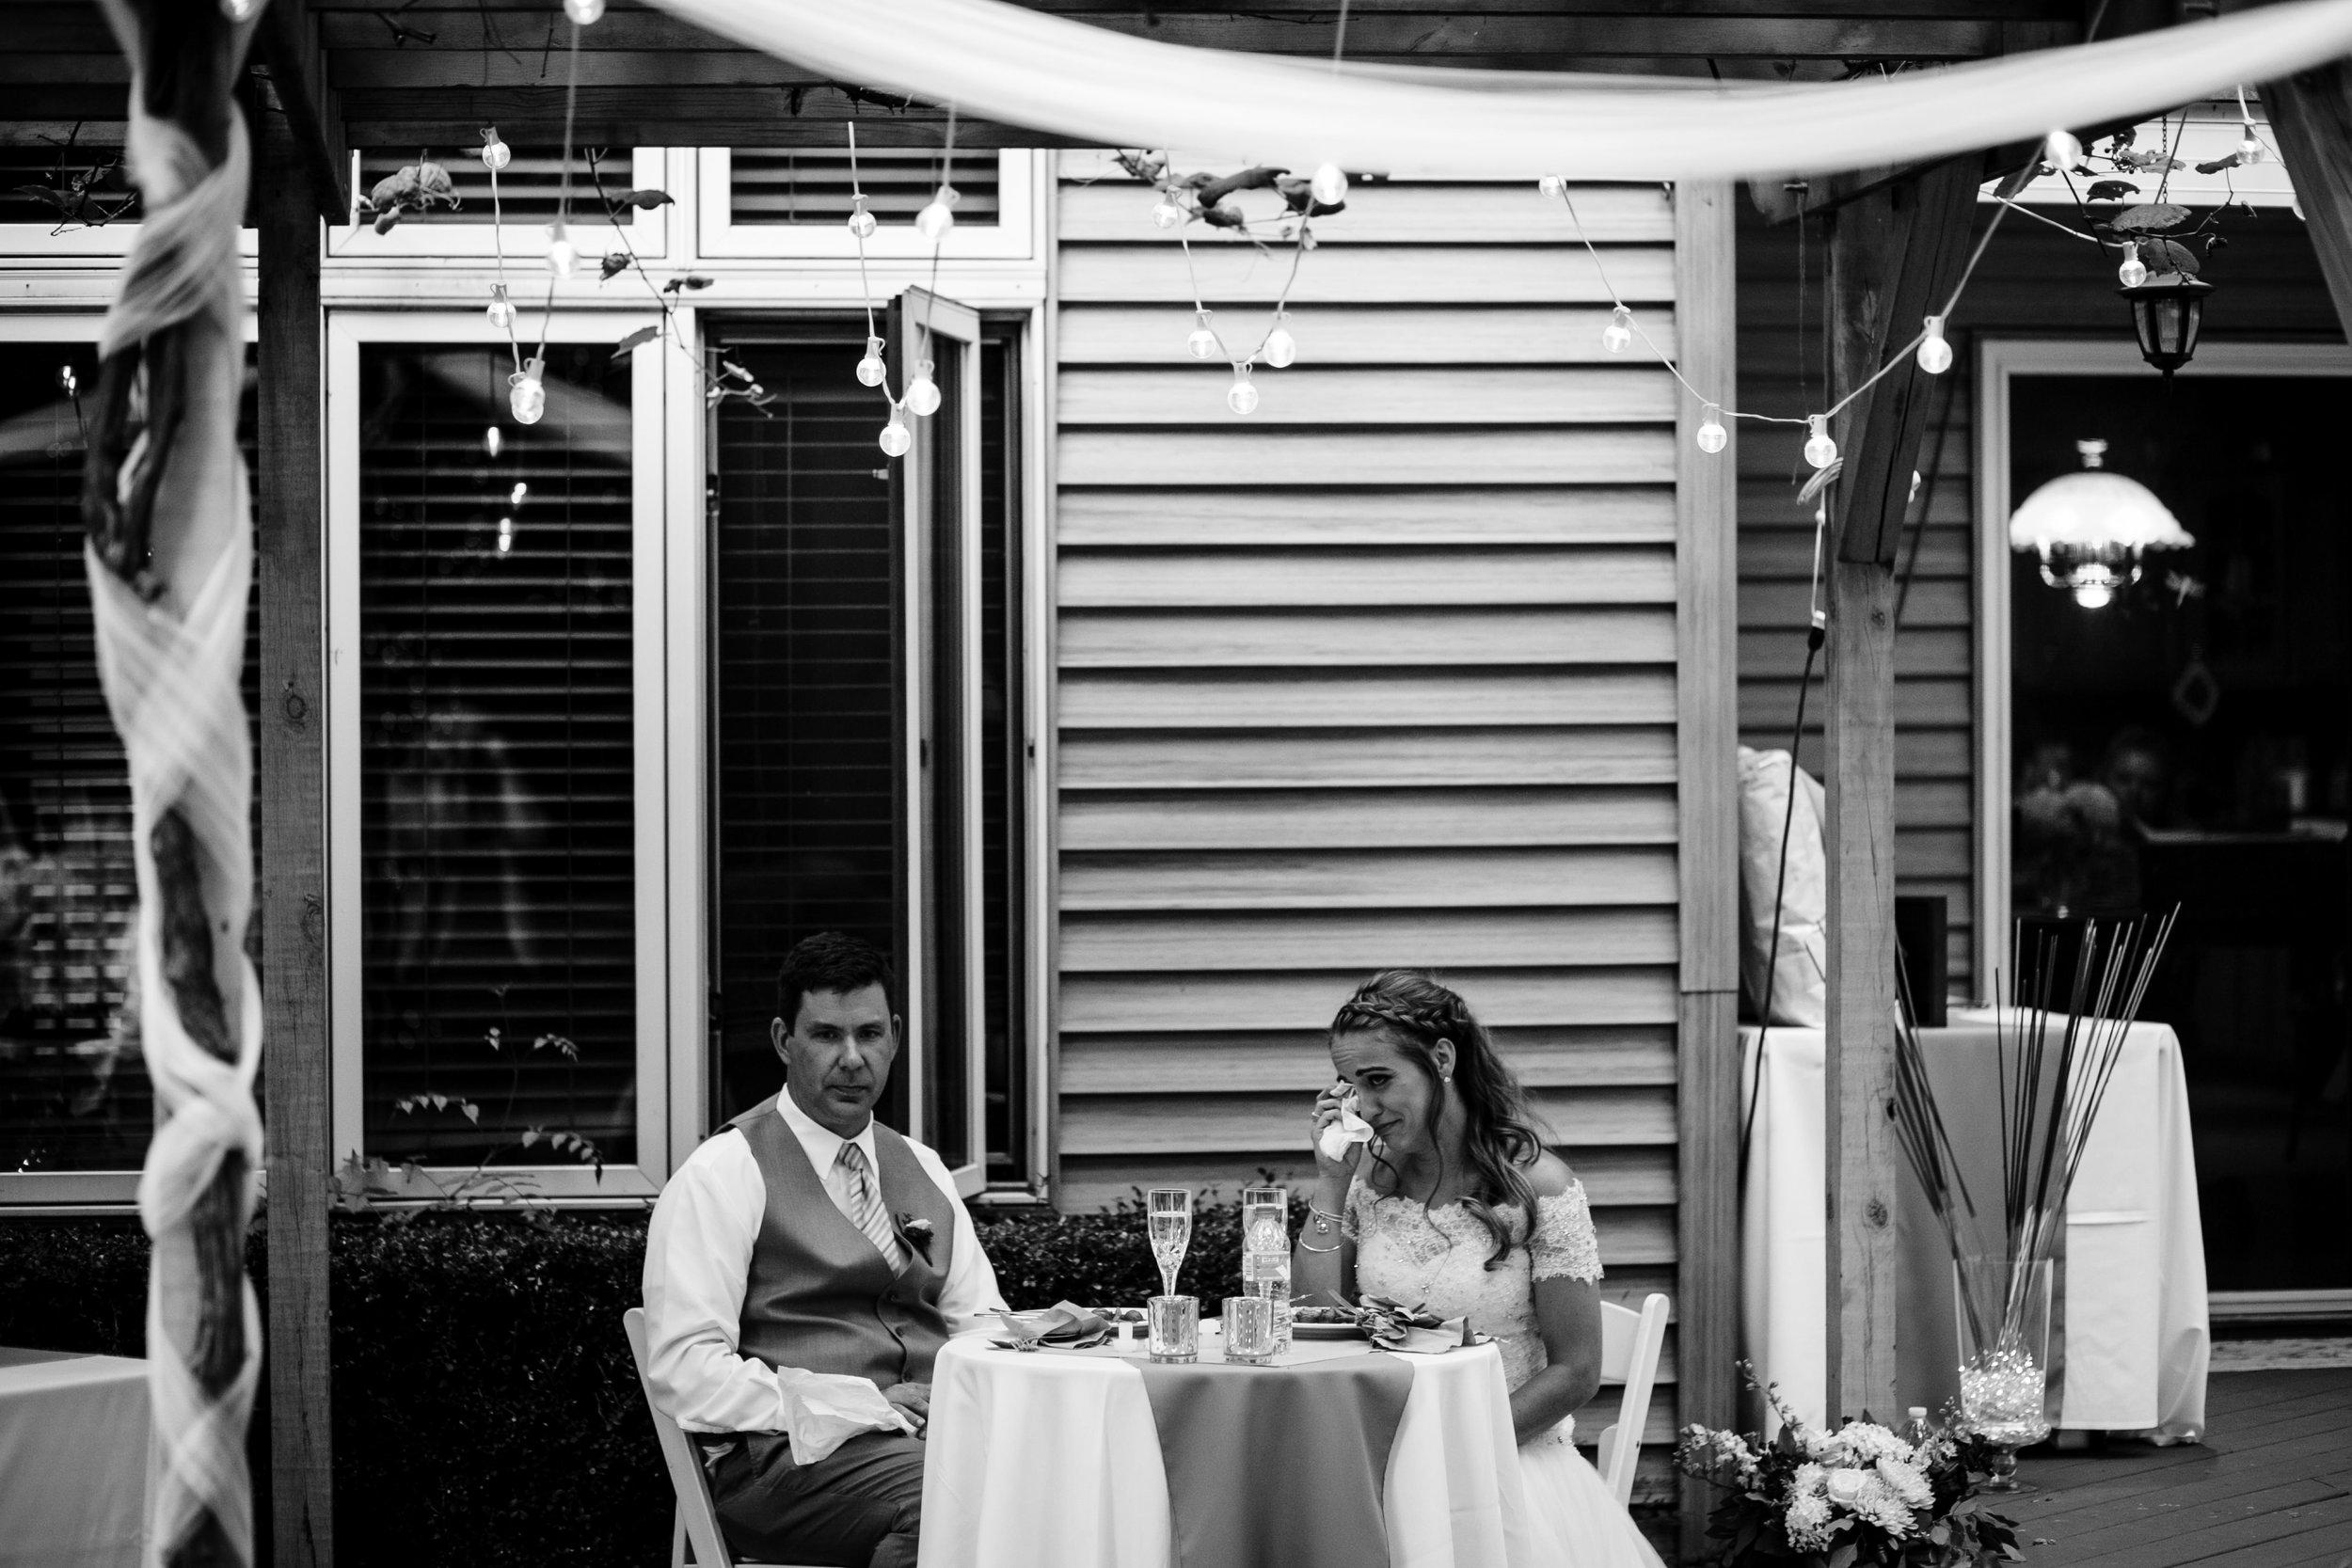 ludington-michigan-intimate-backyard-wedding-jessica-nolan399.jpg